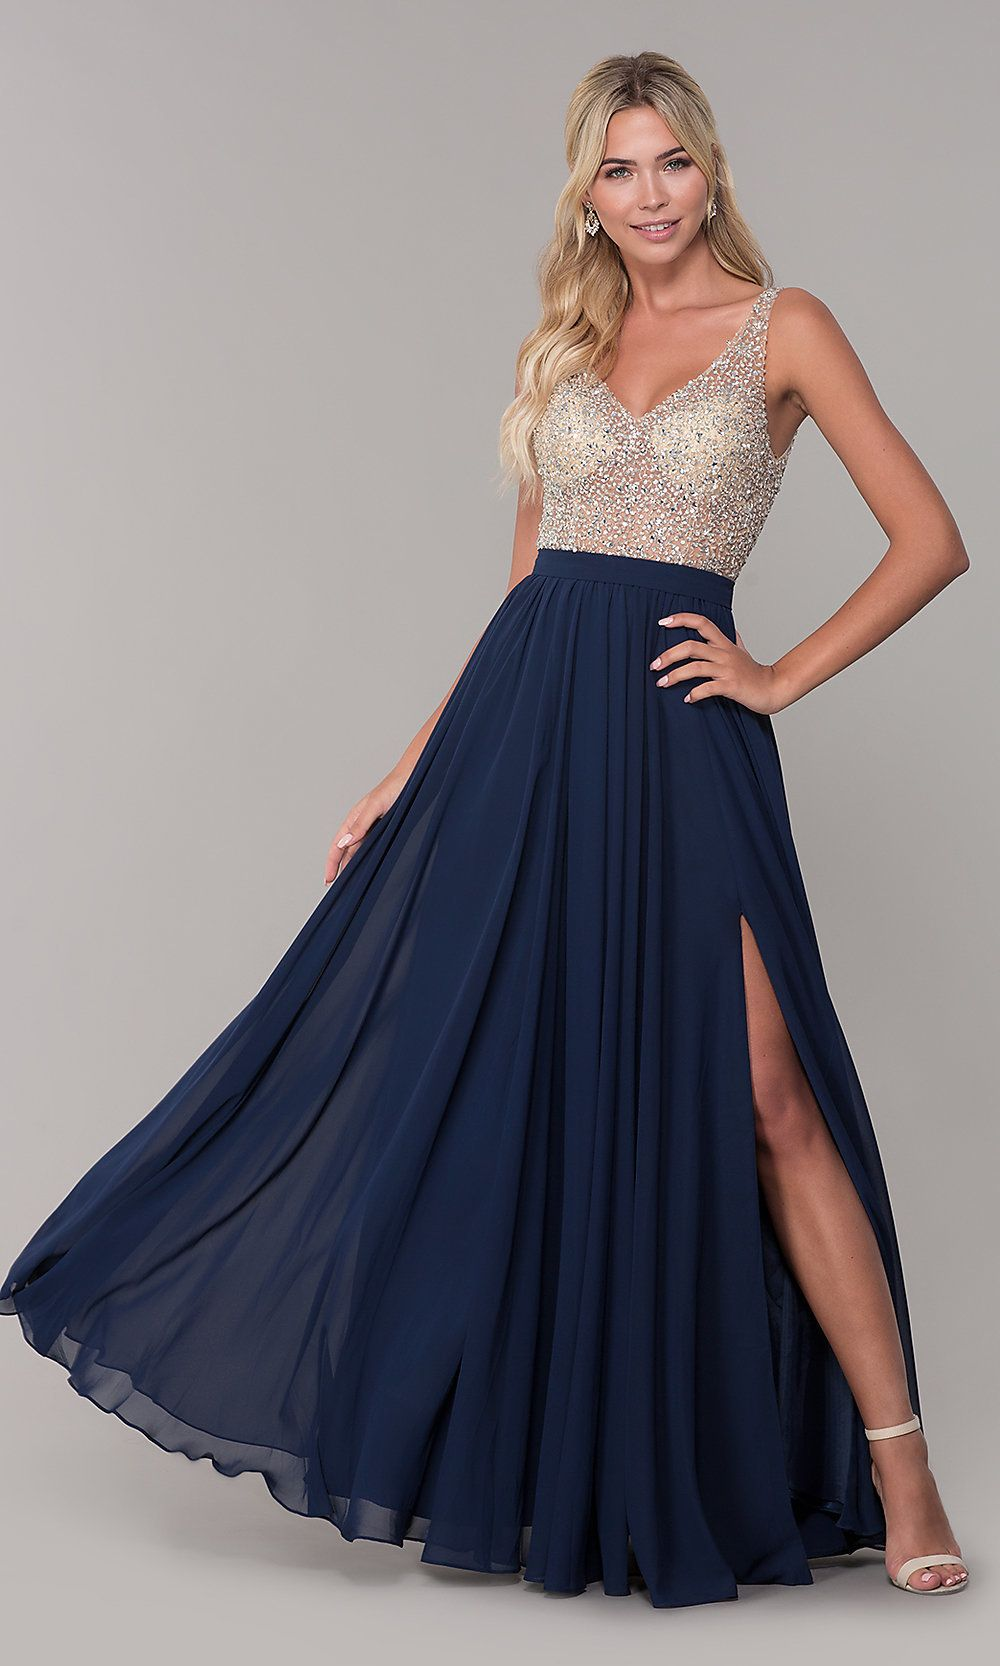 4e012921c6d Illusion-Beaded-Bodice Long Prom Dress - PromGirl